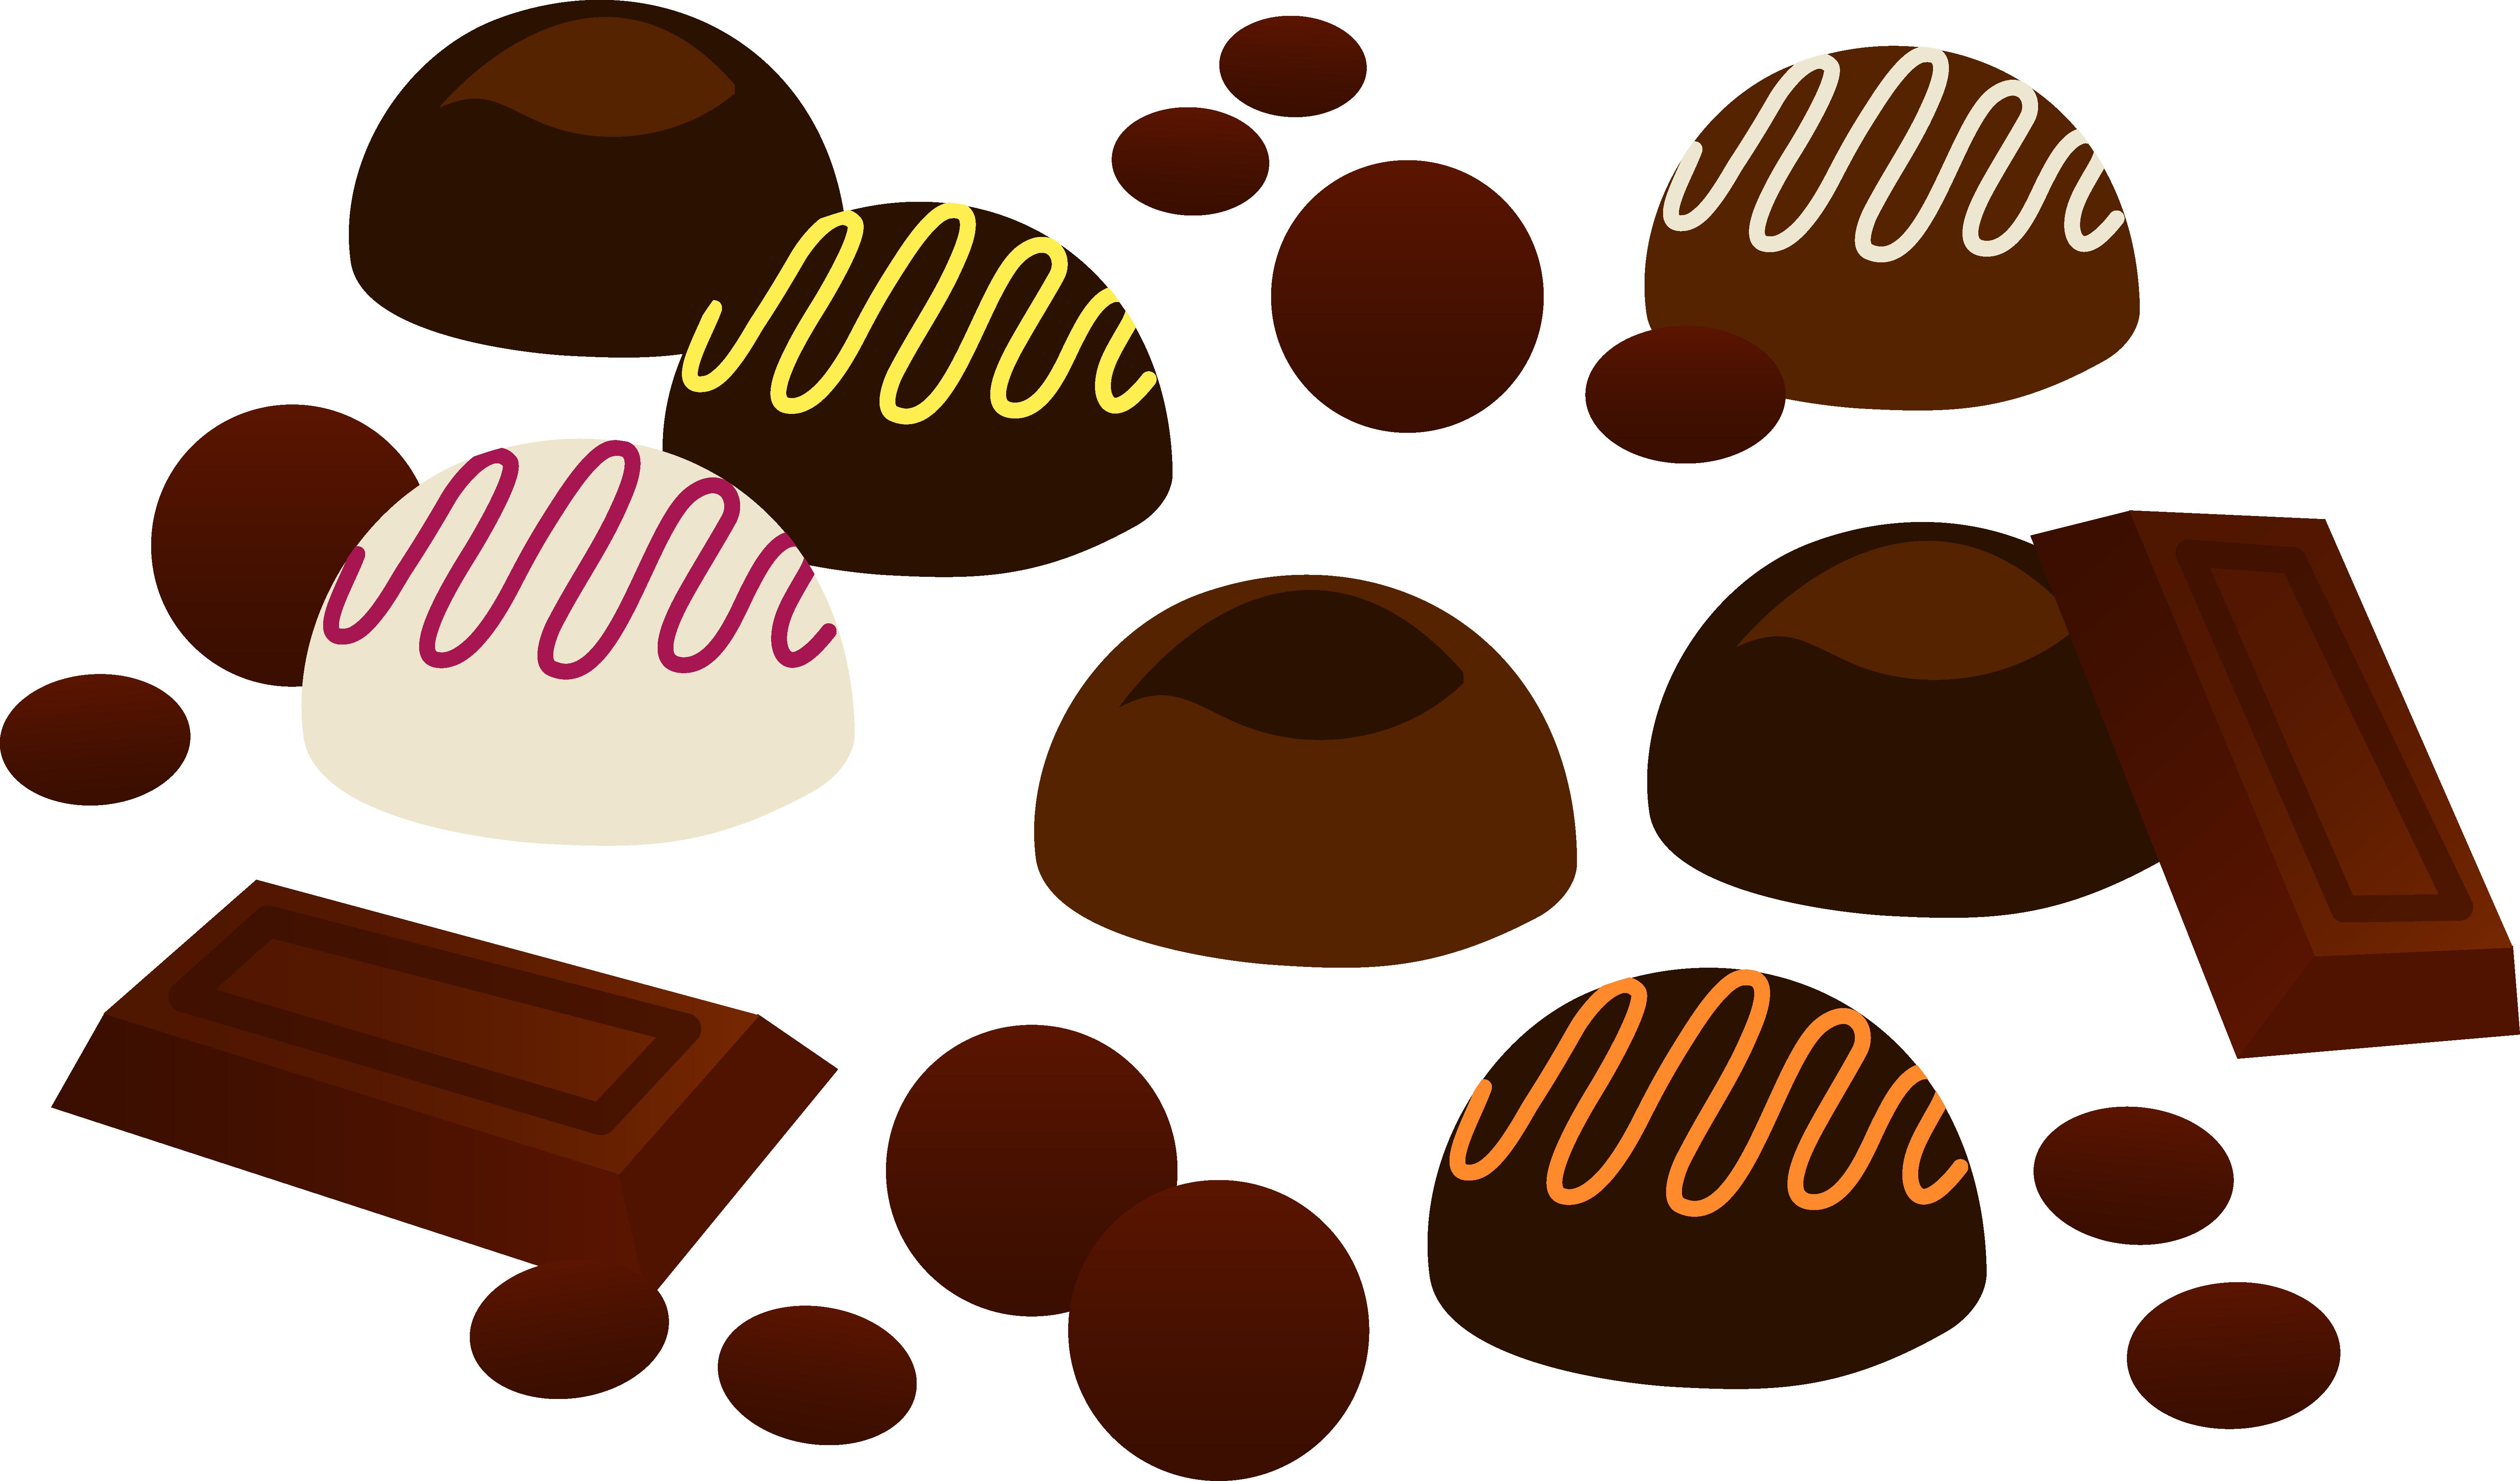 Diner clipart malt shop. Chocolate candy